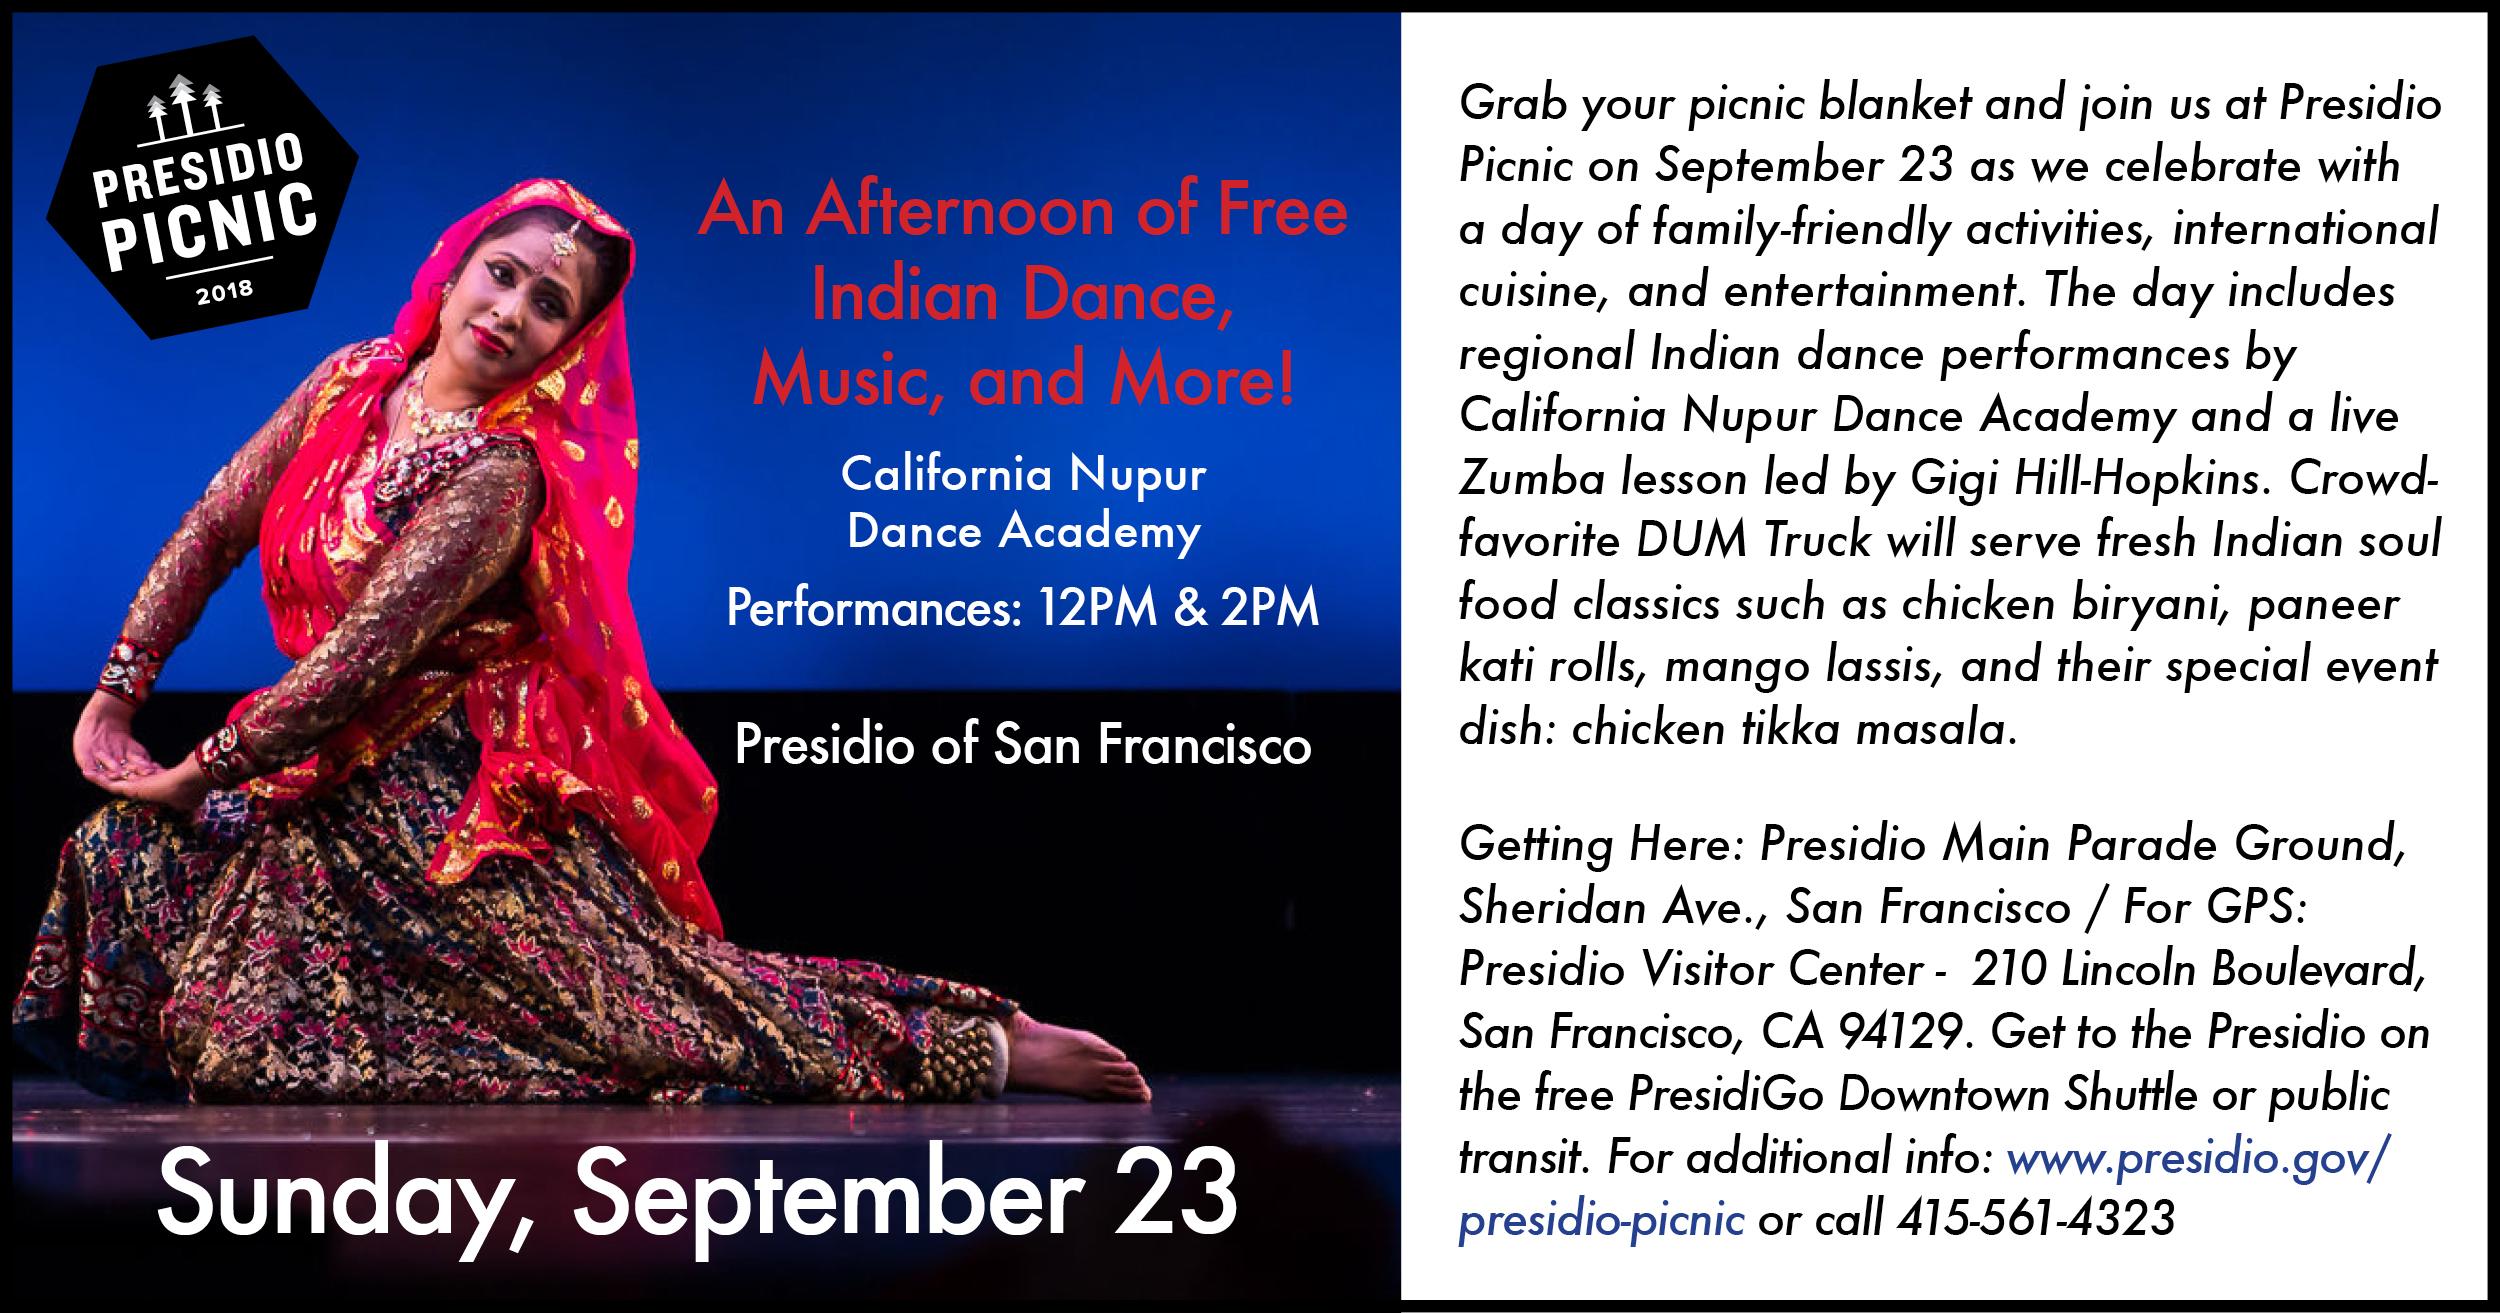 Presidio Picnic: Indian Day